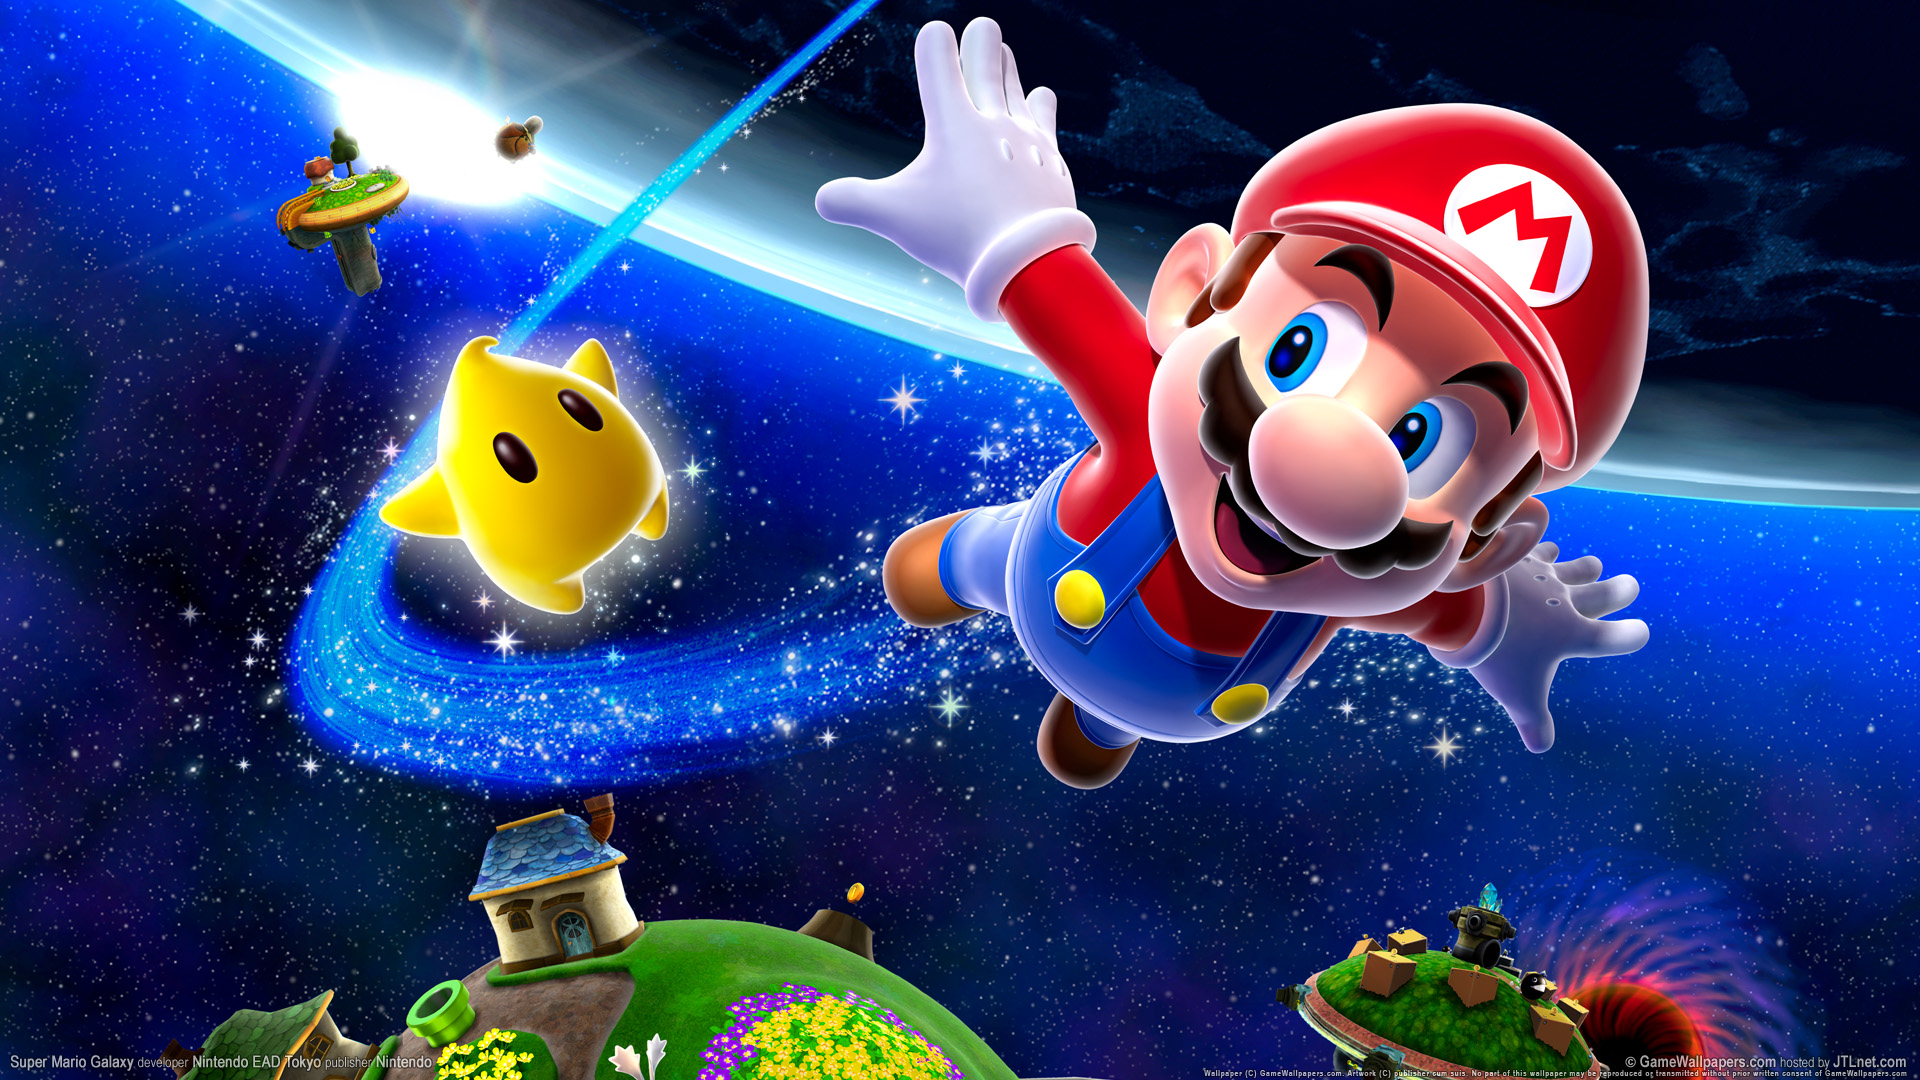 Super Mario 3D Exclusive HD Wallpapers 2595 1920x1080